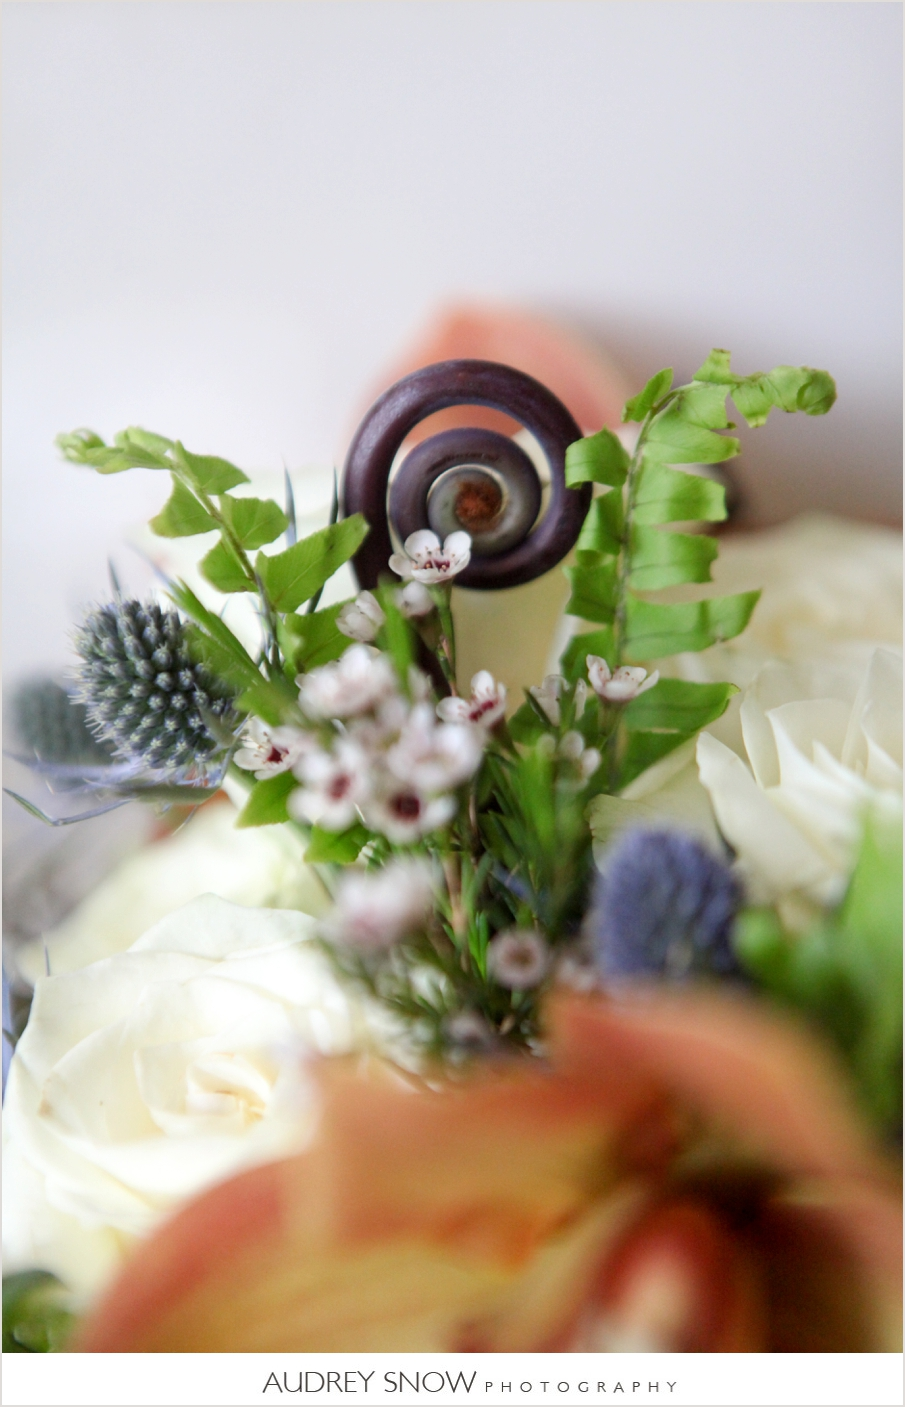 audreysnow-photography-naples-botanical-garden_3553.jpg